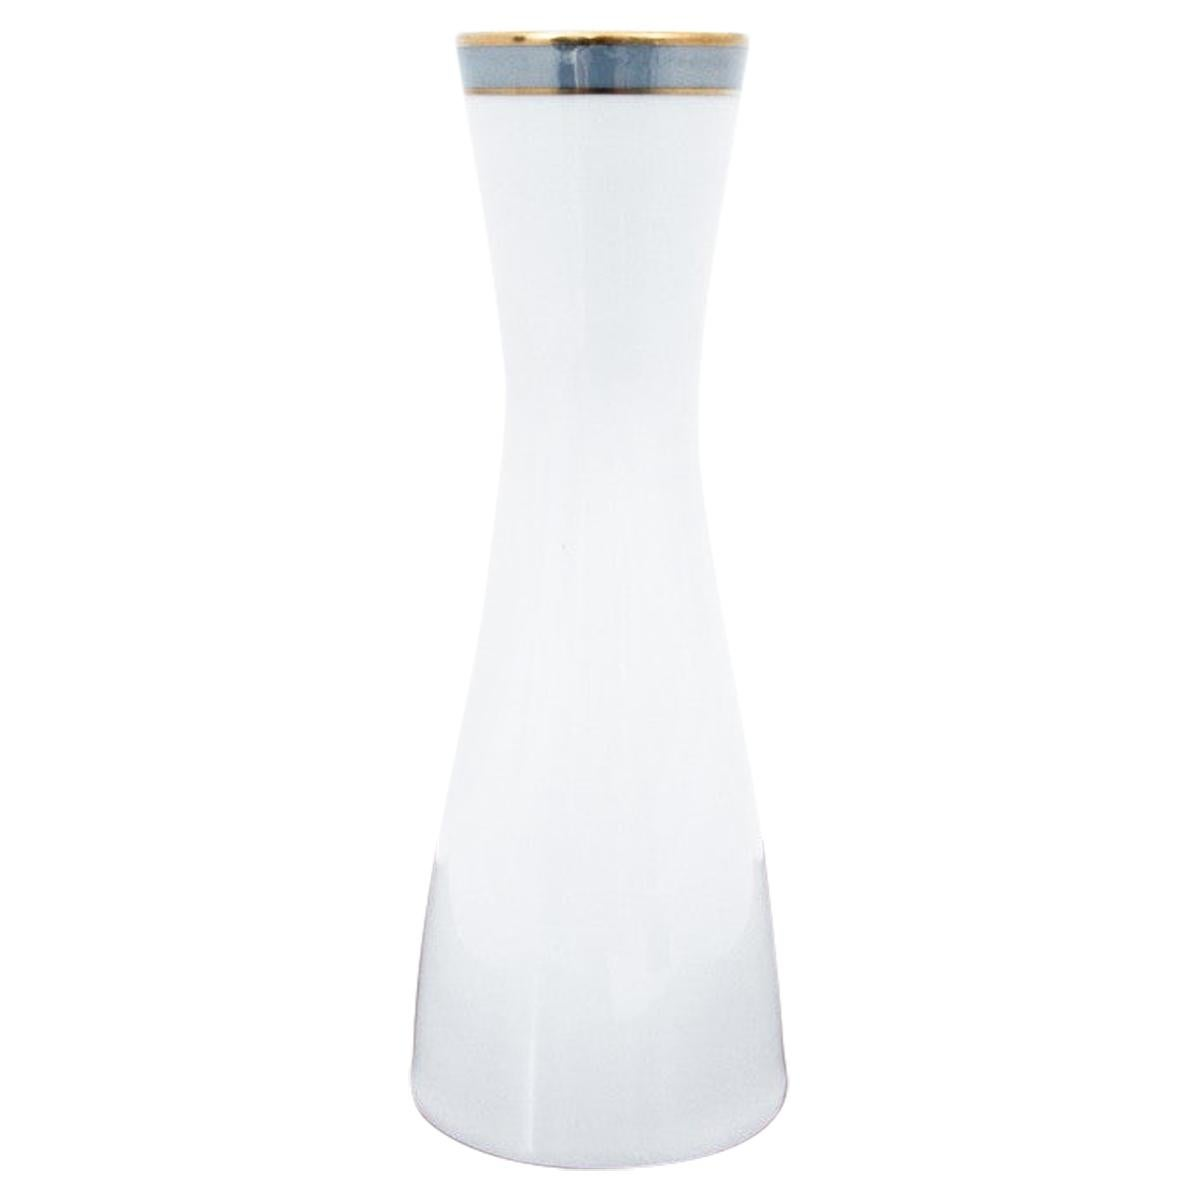 Rosenthal Vase Art Deco, Germany